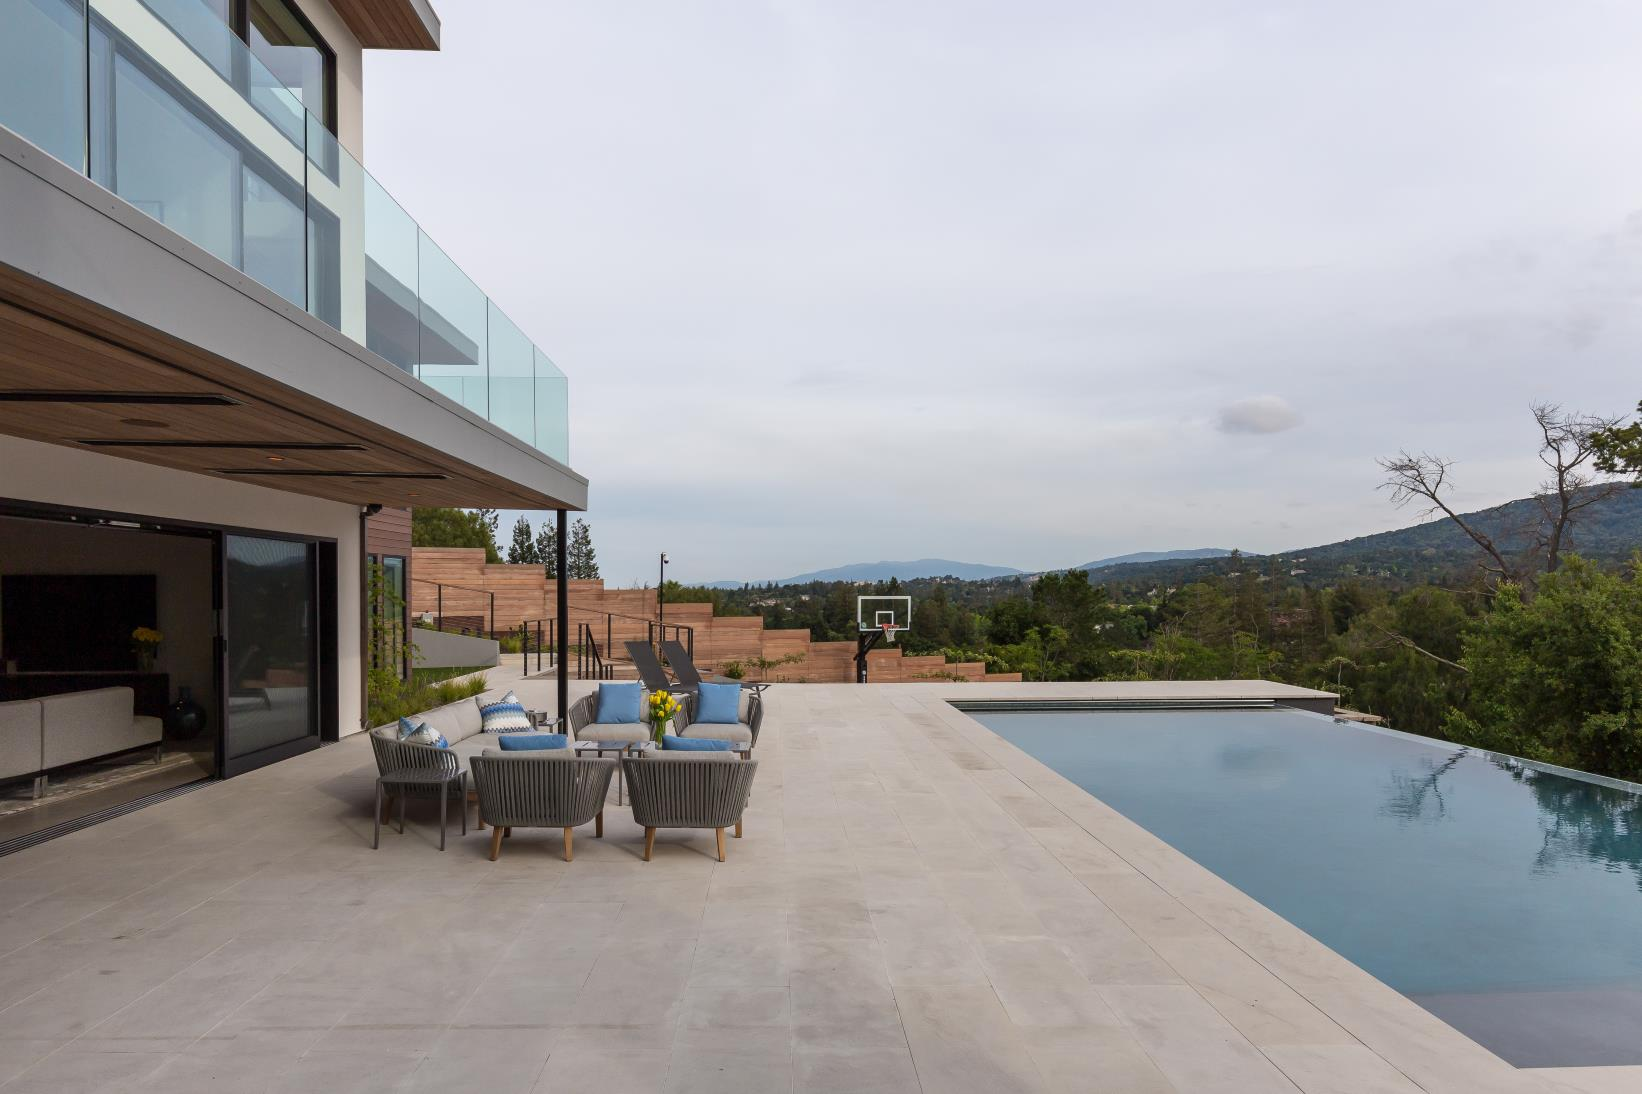 M design architect Ruth Residence